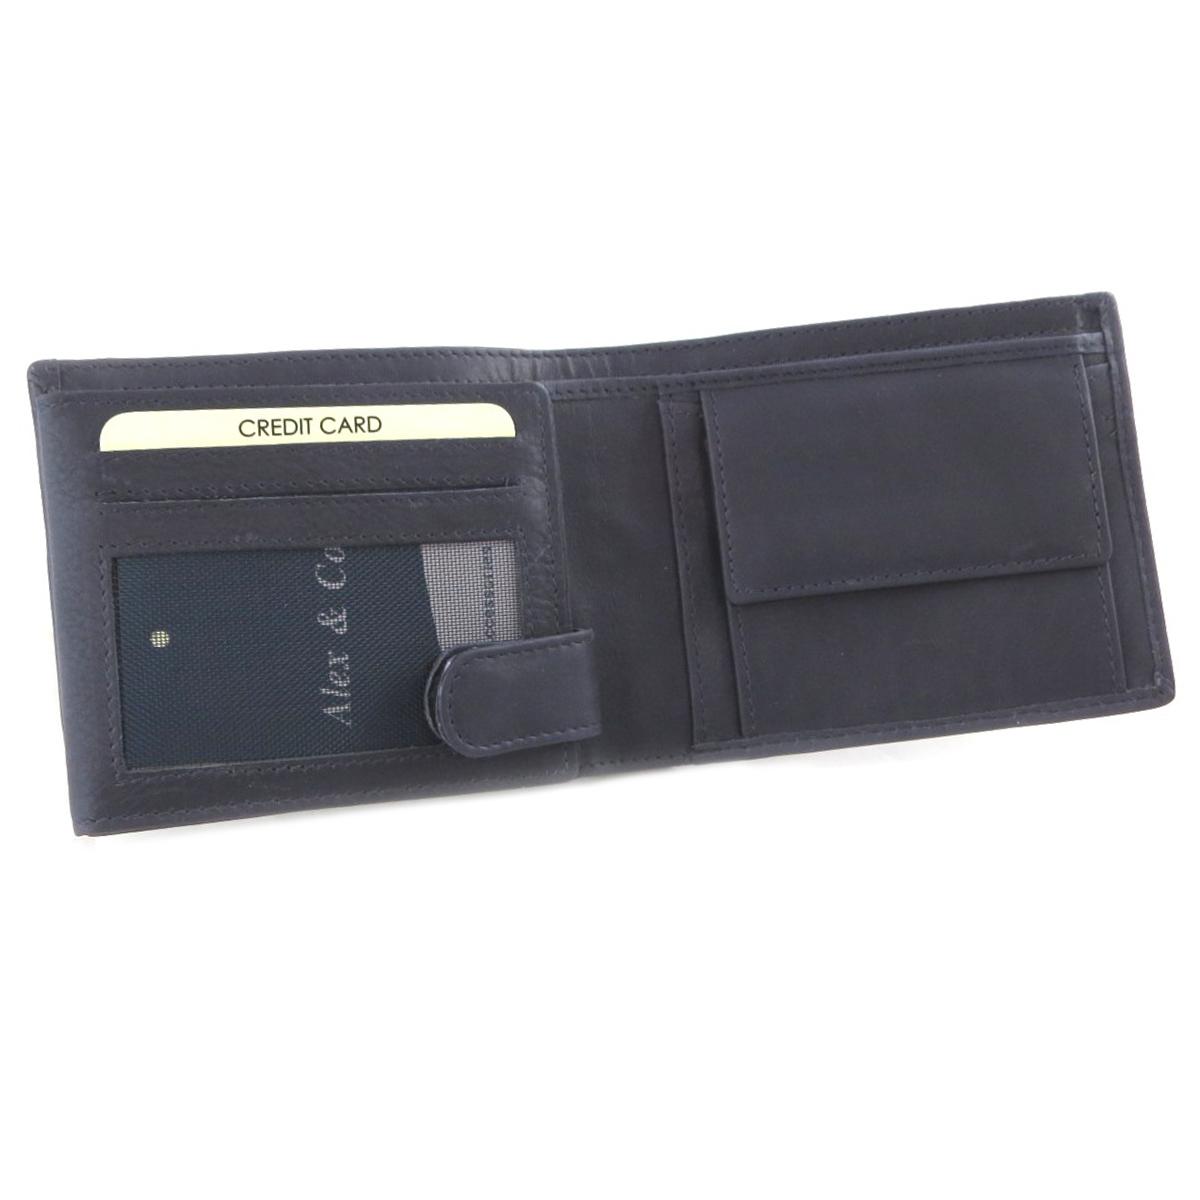 Portefeuille italien cuir \'Gianni Conti\' marine - 12x95x3 cm - [P9871]